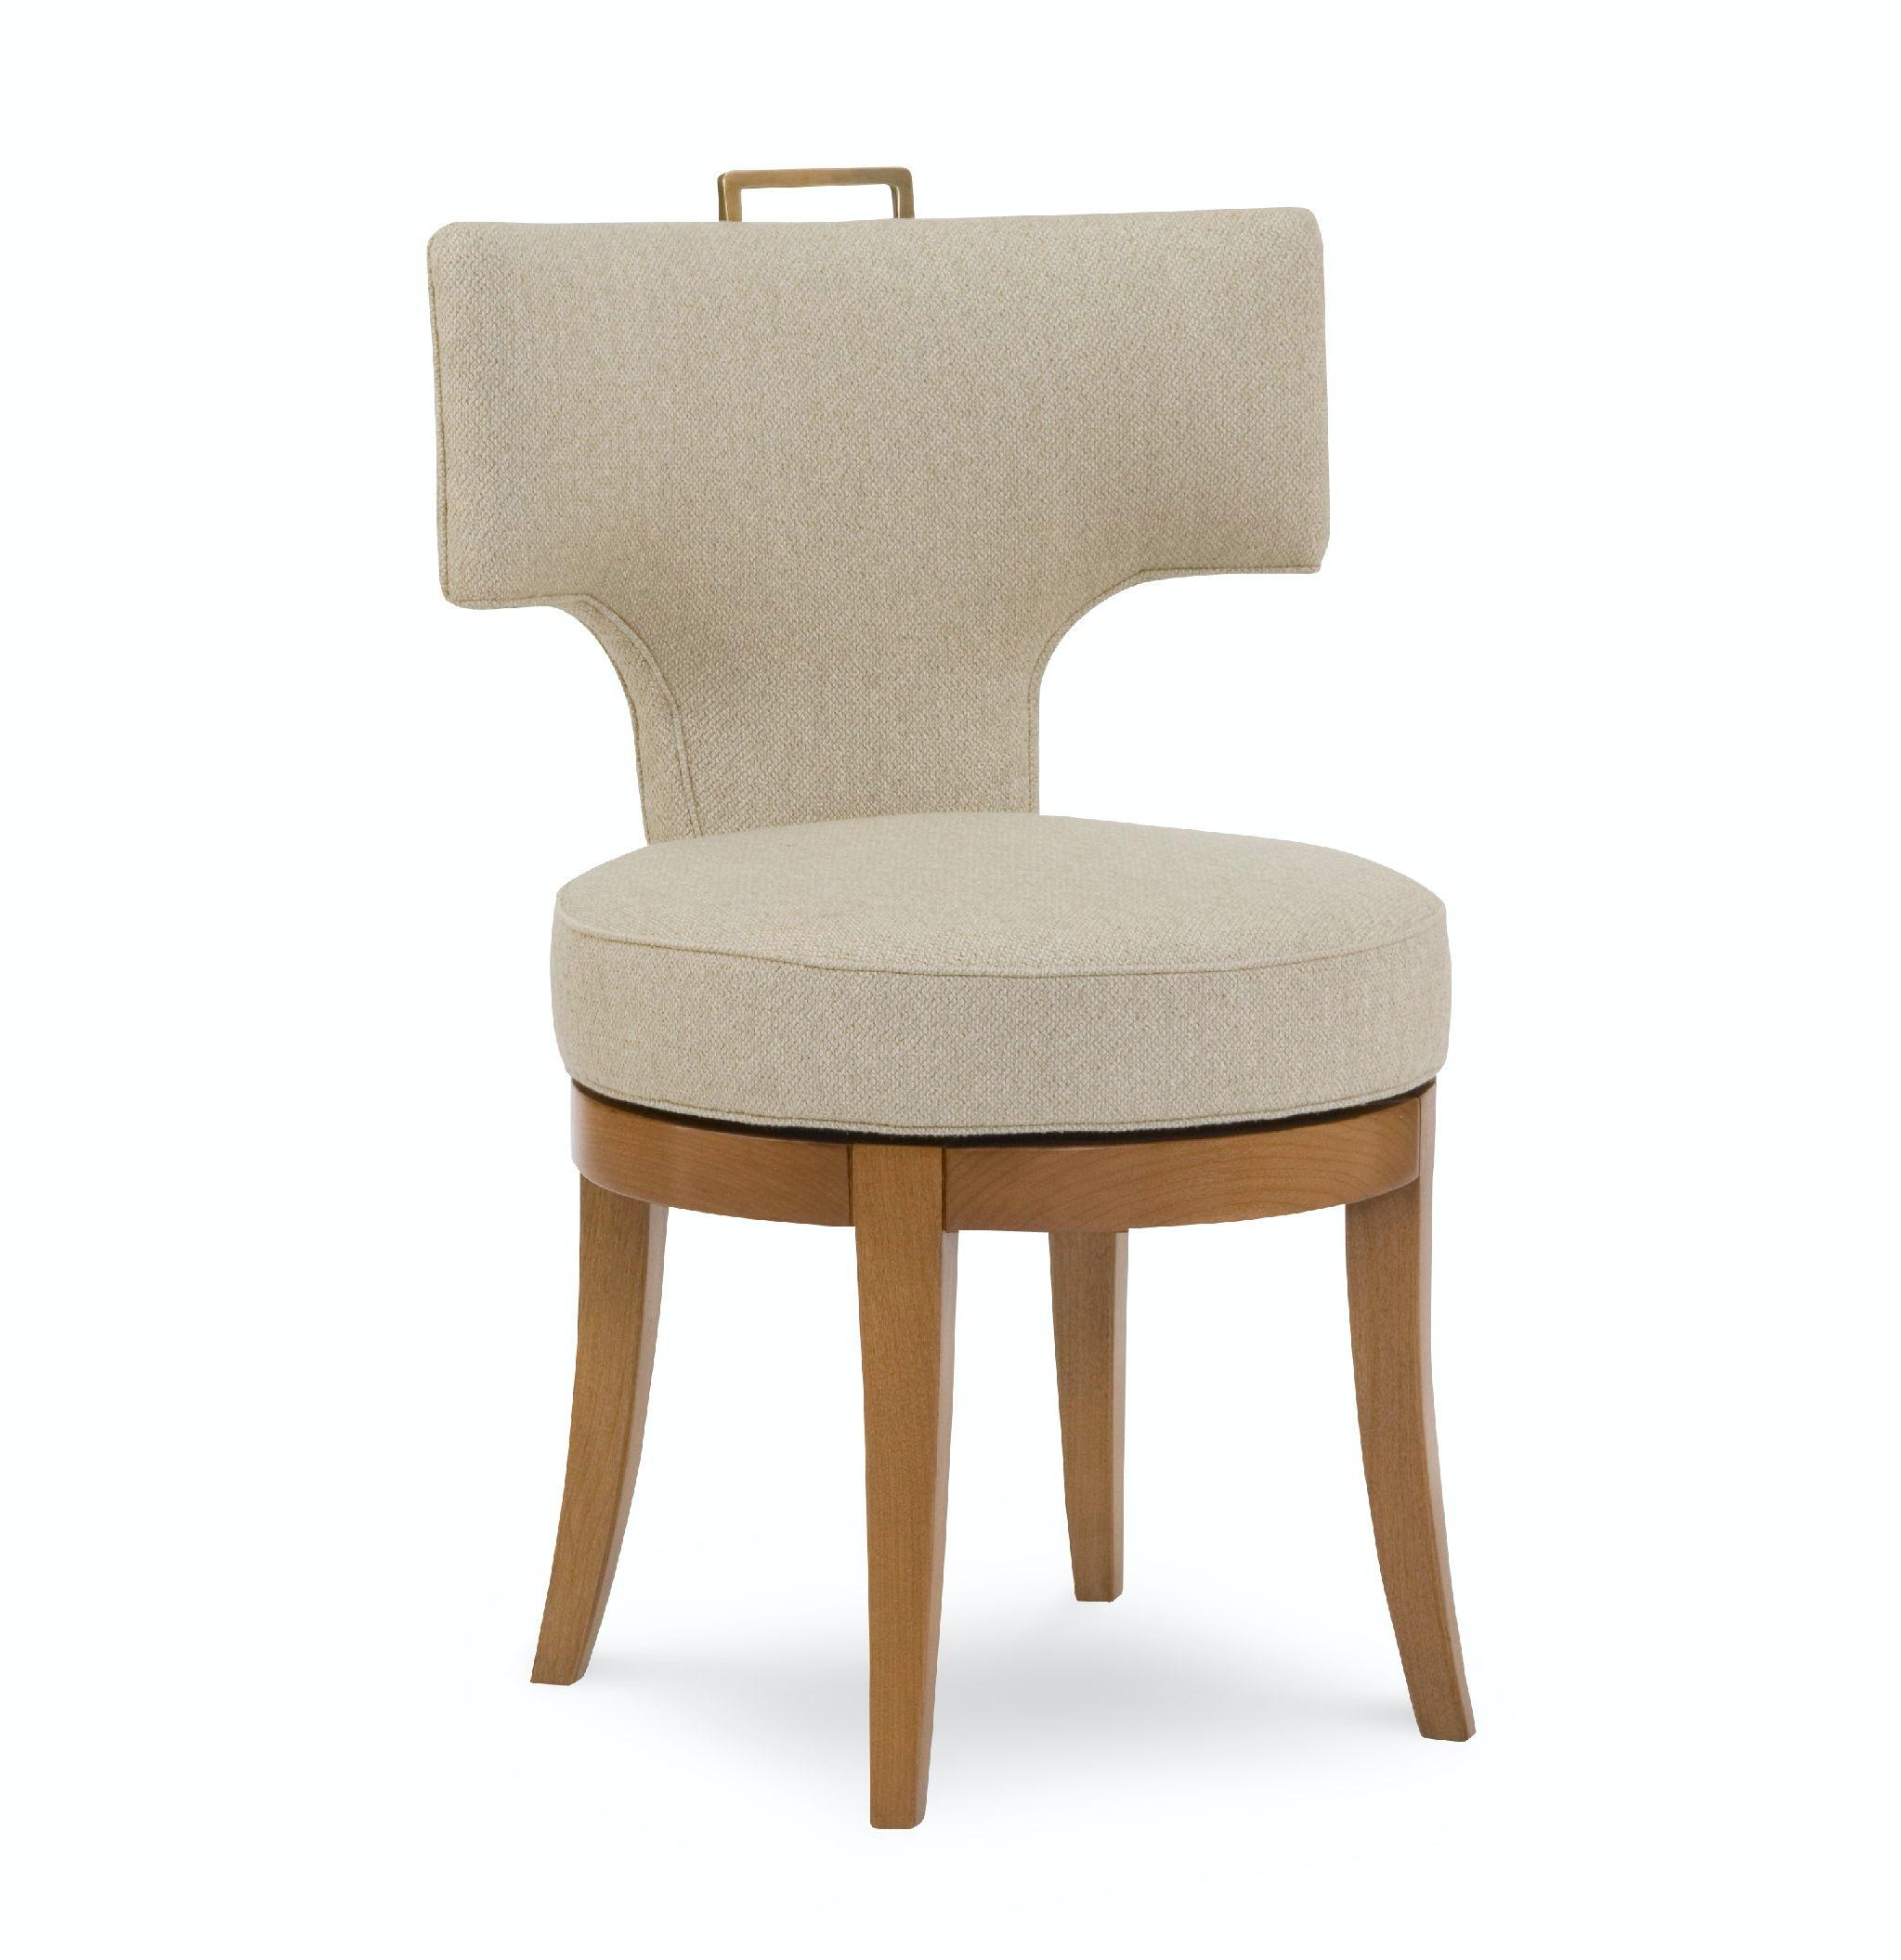 swivel chair quotes salon mat chaddock dining room kerylos de0384 studio